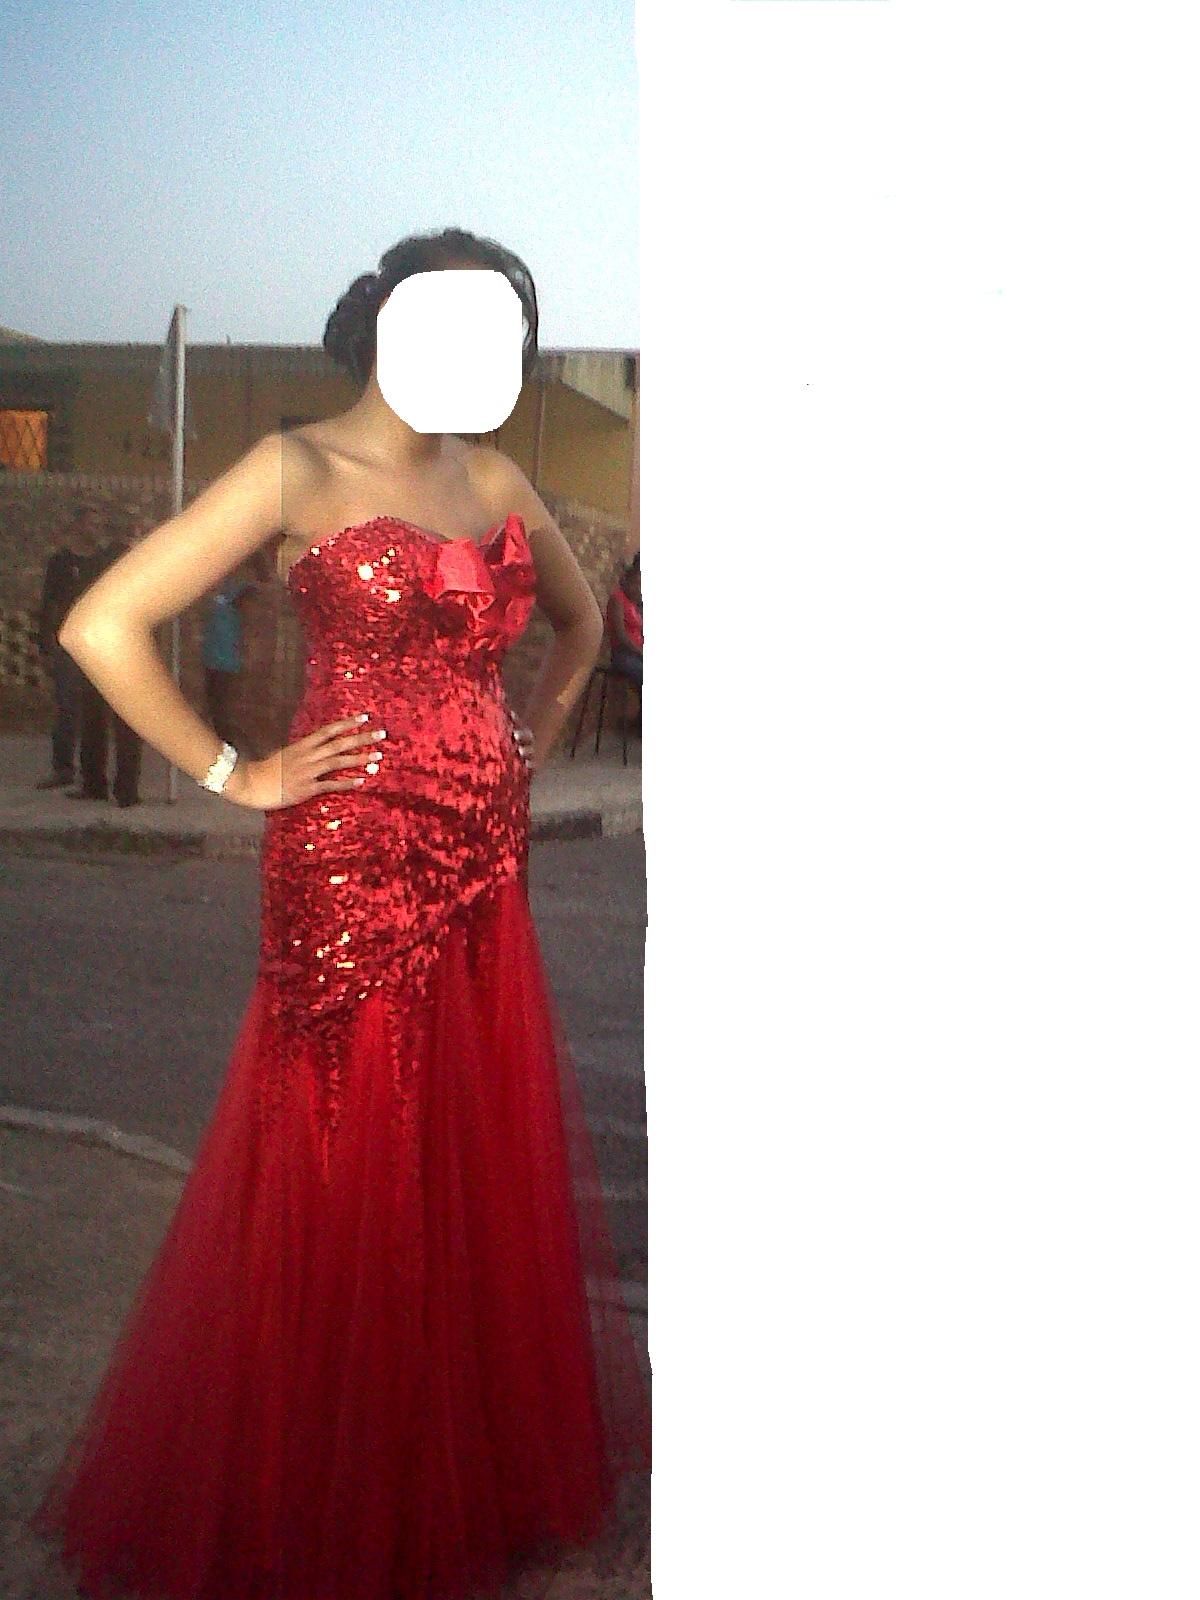 Stunning Red Evening/Matric Farewell Dress for R3500.00